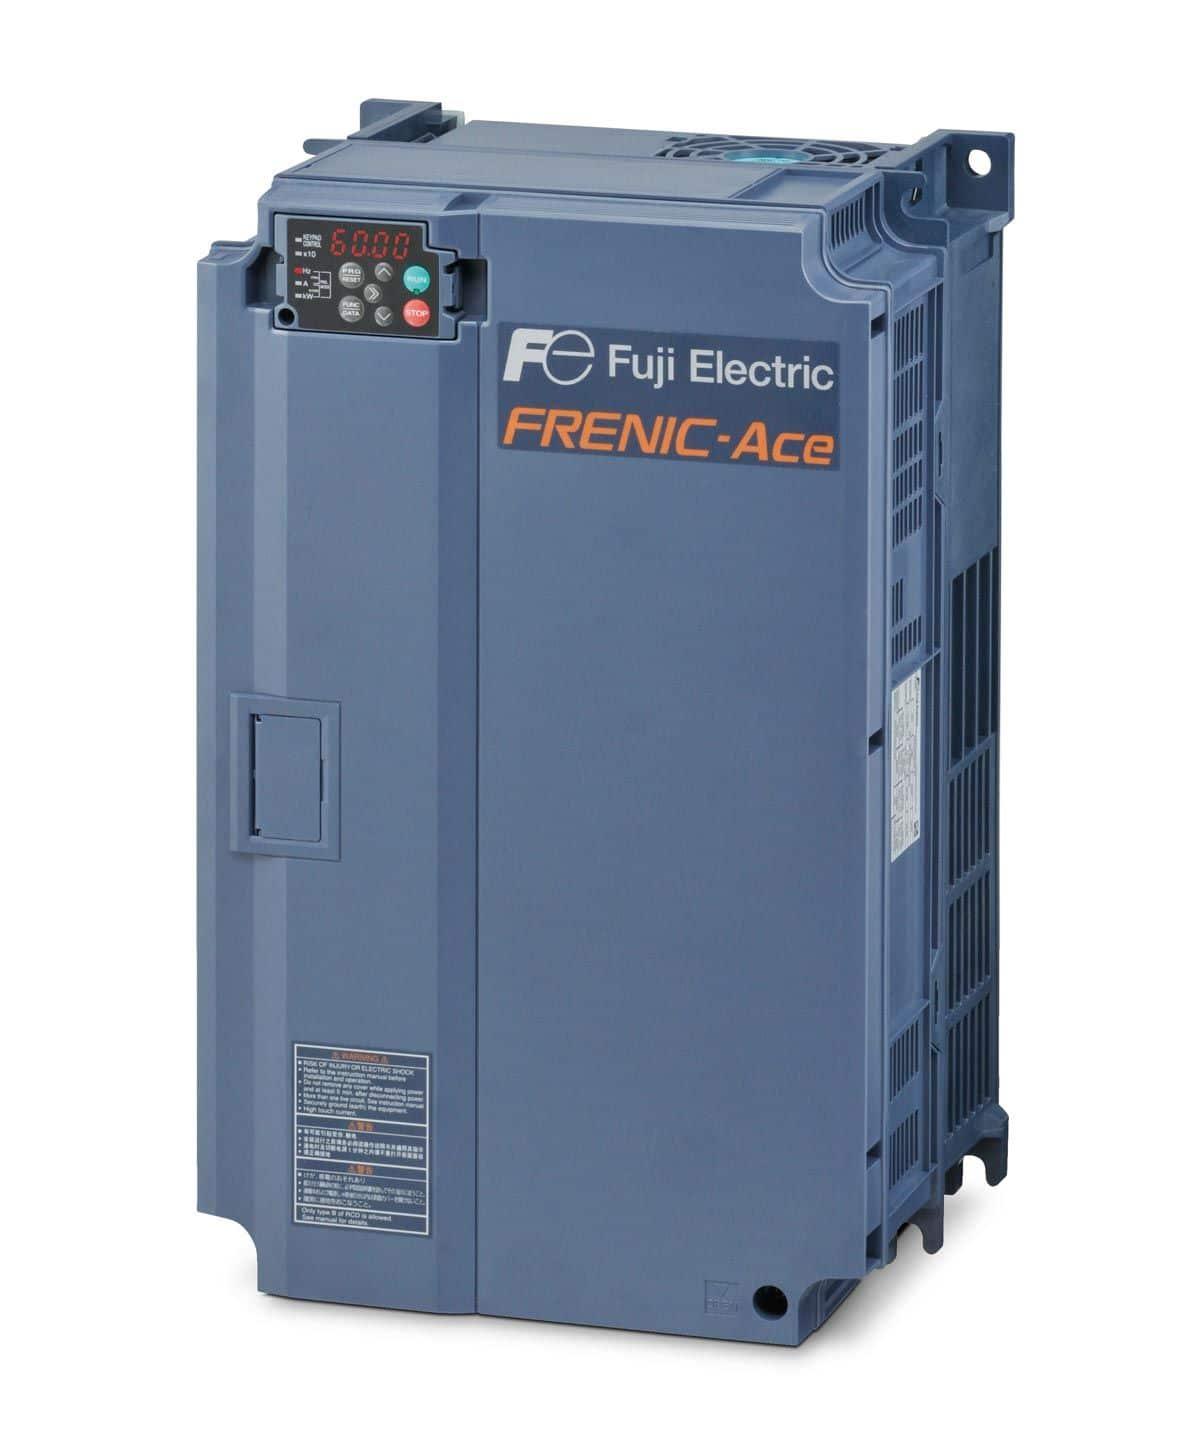 VFD Drives - Industrial Power Inverter AC Drives | Fuji Electric ...